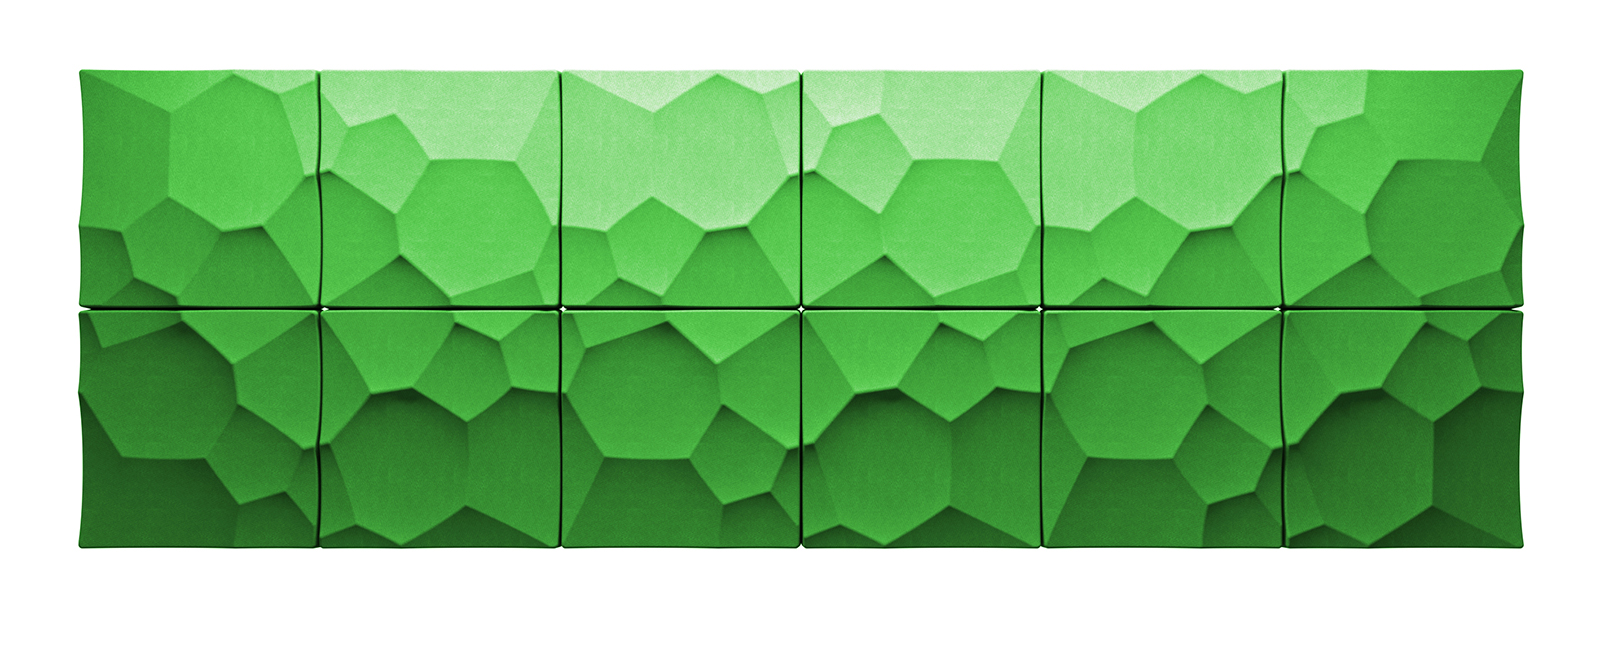 Autex Quietspace 3D-Tiles S-5.28 | Granny Smith